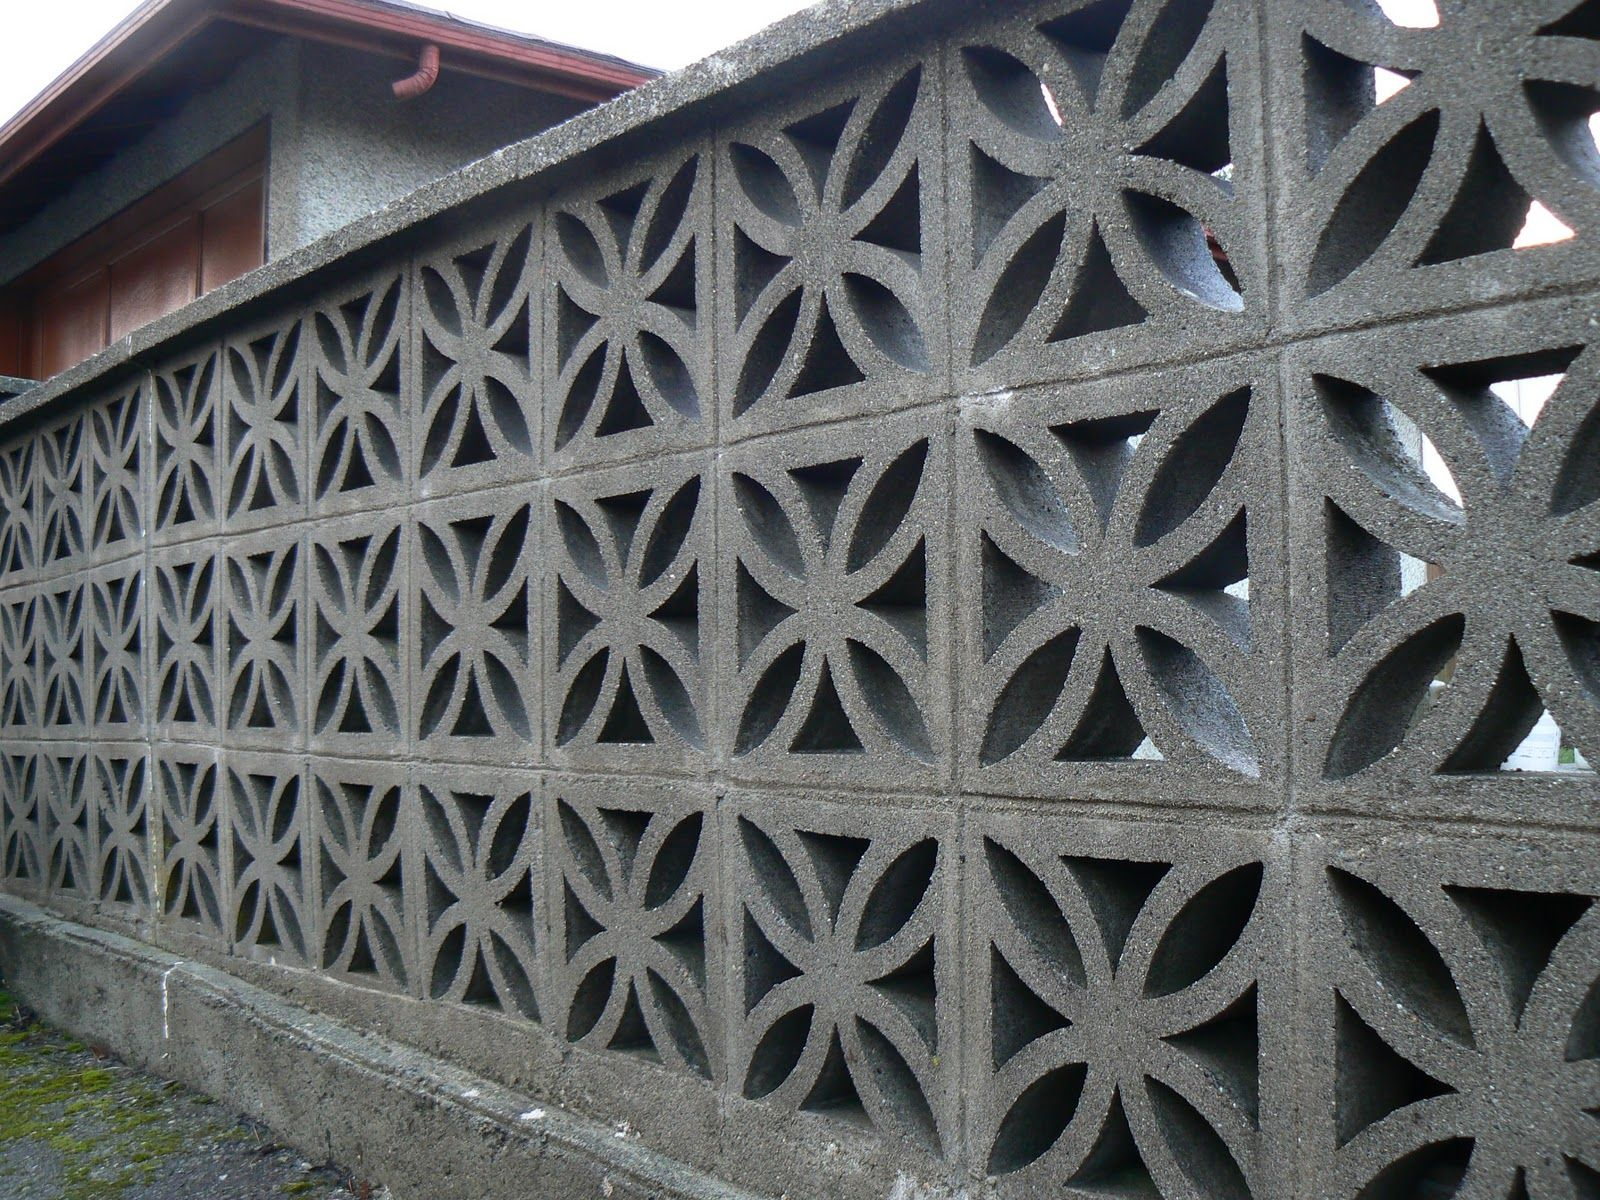 Home Depot Cinder Block For Home Foundations And Wall Decoration Masonry Bricks Home Dep Decorative Concrete Blocks Decorative Cinder Blocks Concrete Blocks